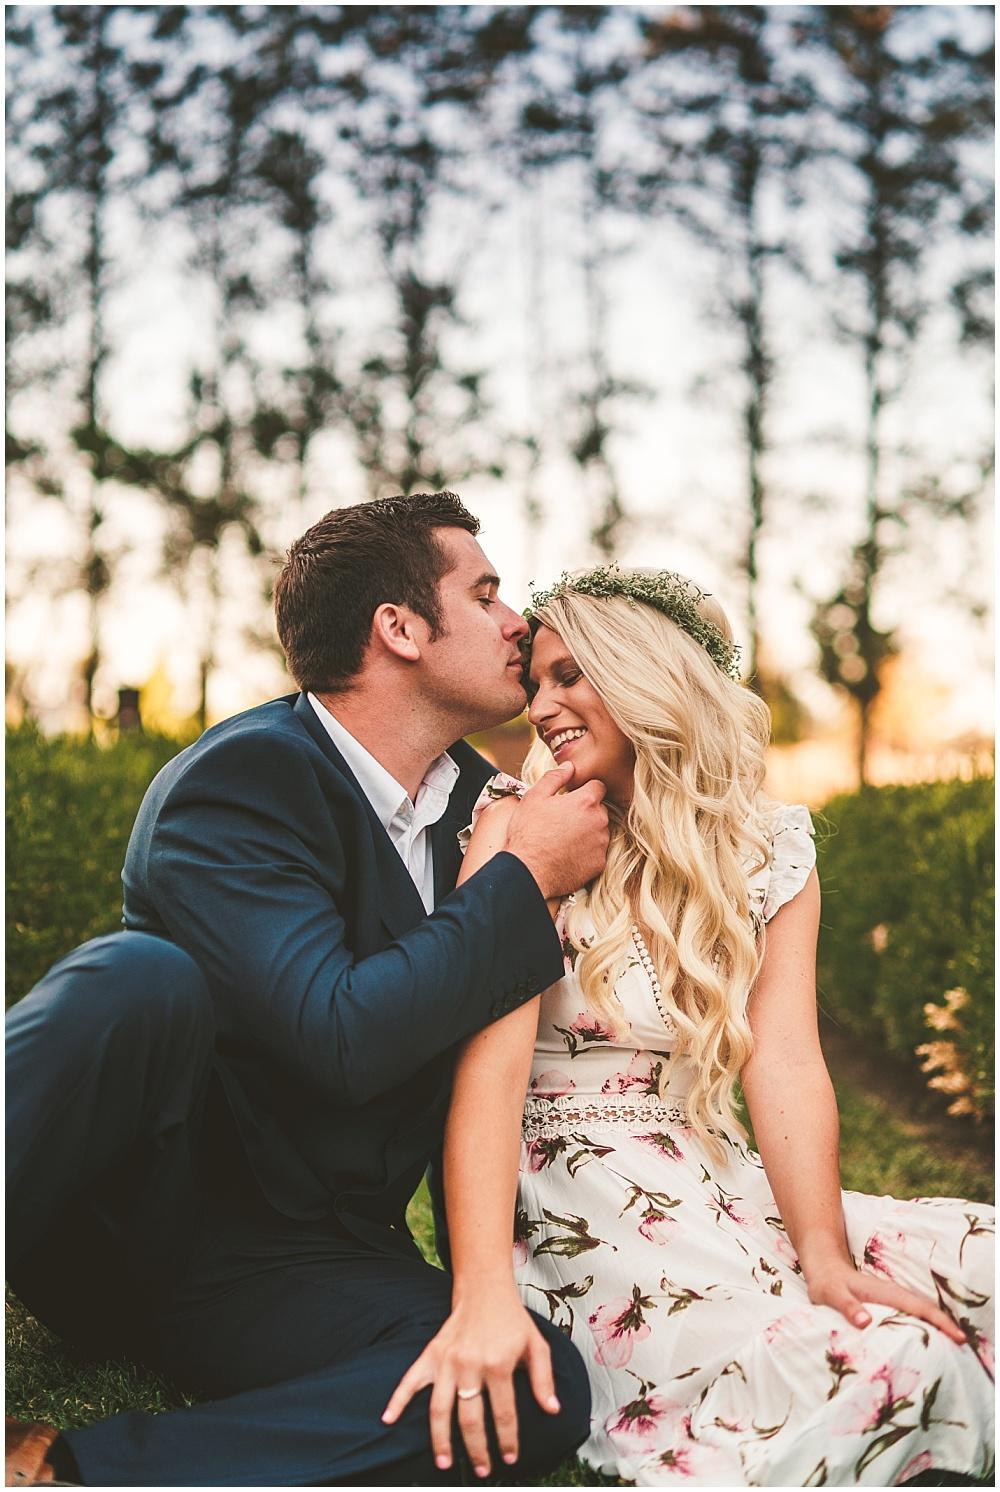 Fall golden hour engagement shoot | Alecio Photography